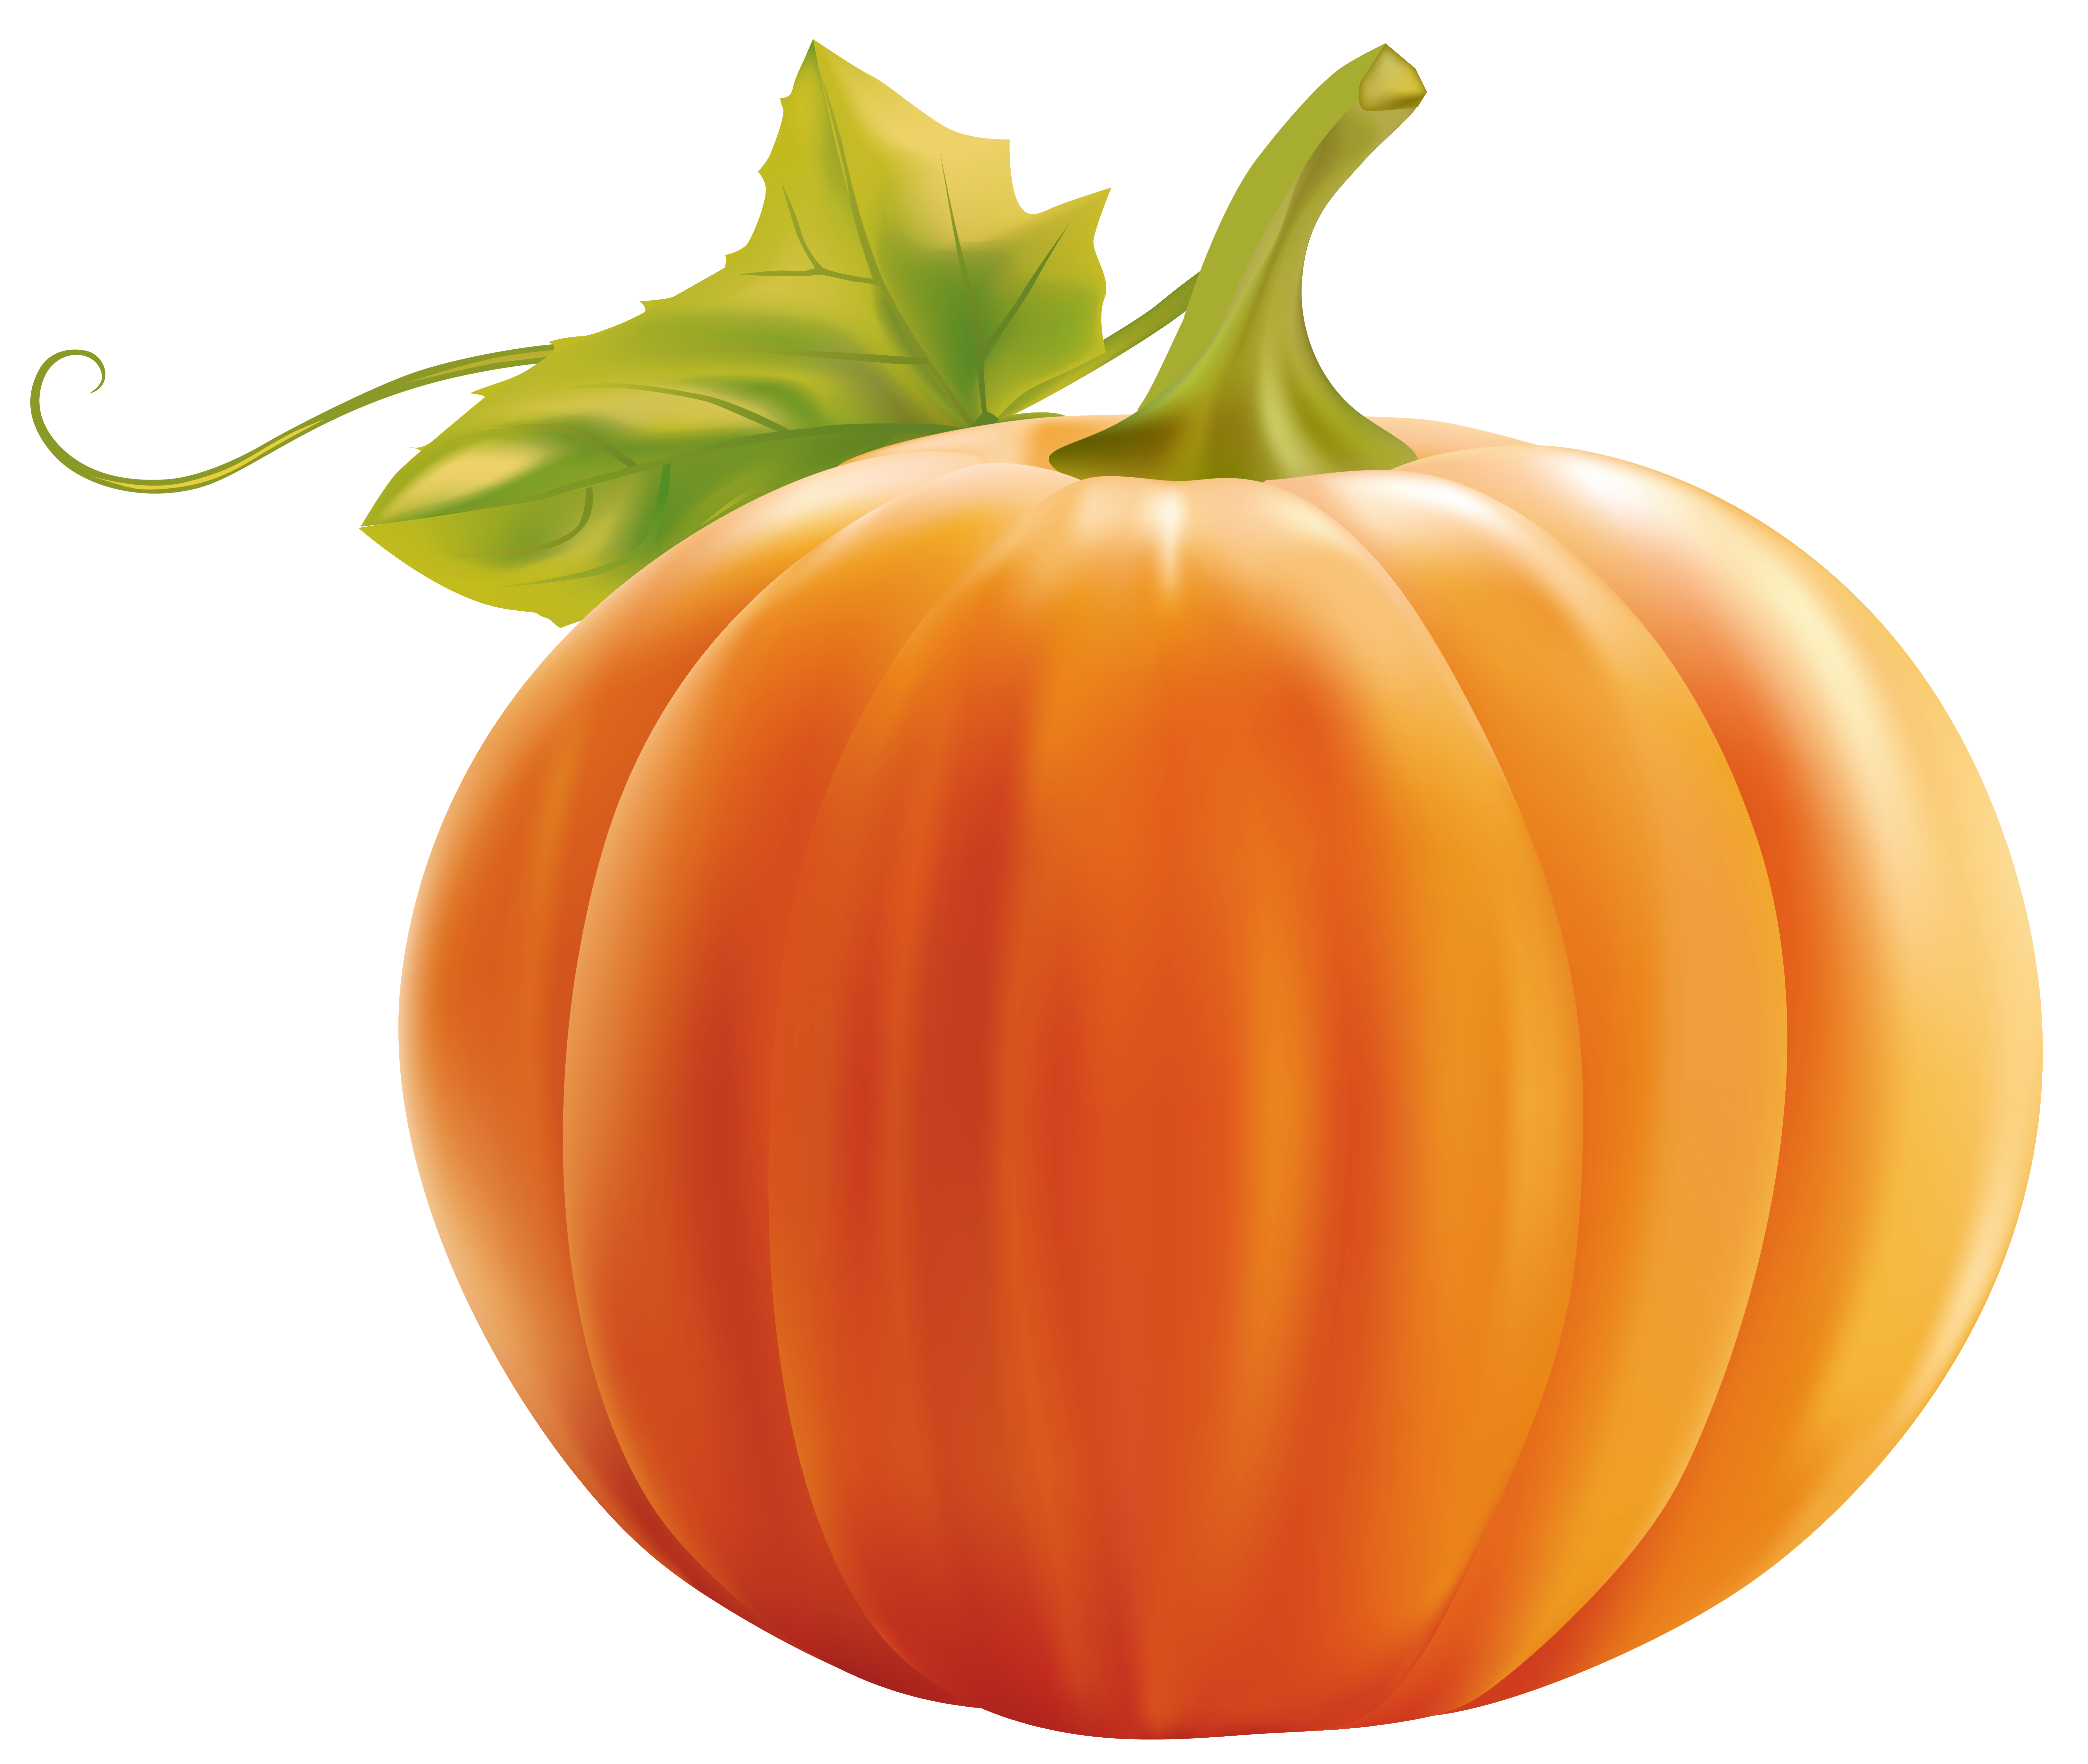 6258x5286 Free Halloween Pumpkins Clipart Public Domain Clip Art 3